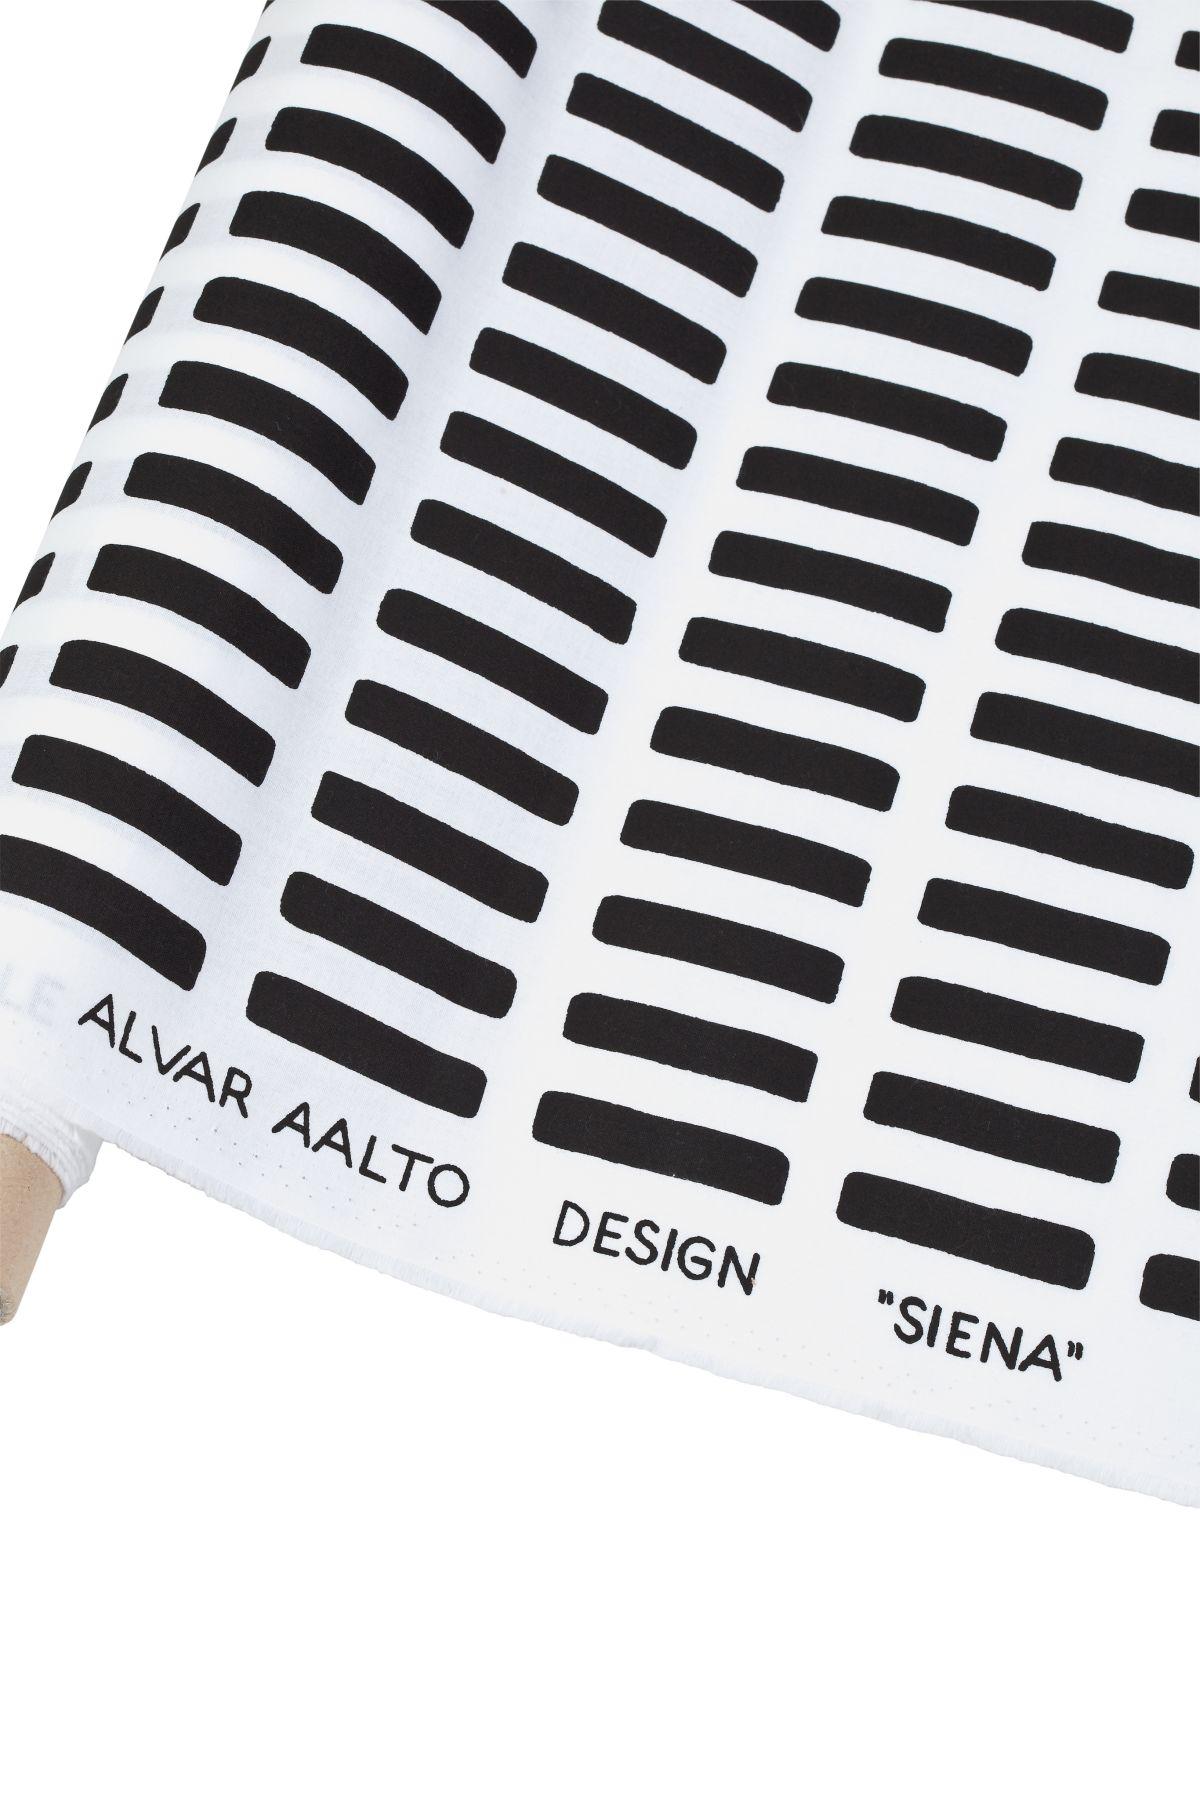 Siena-Fabric-White-Black